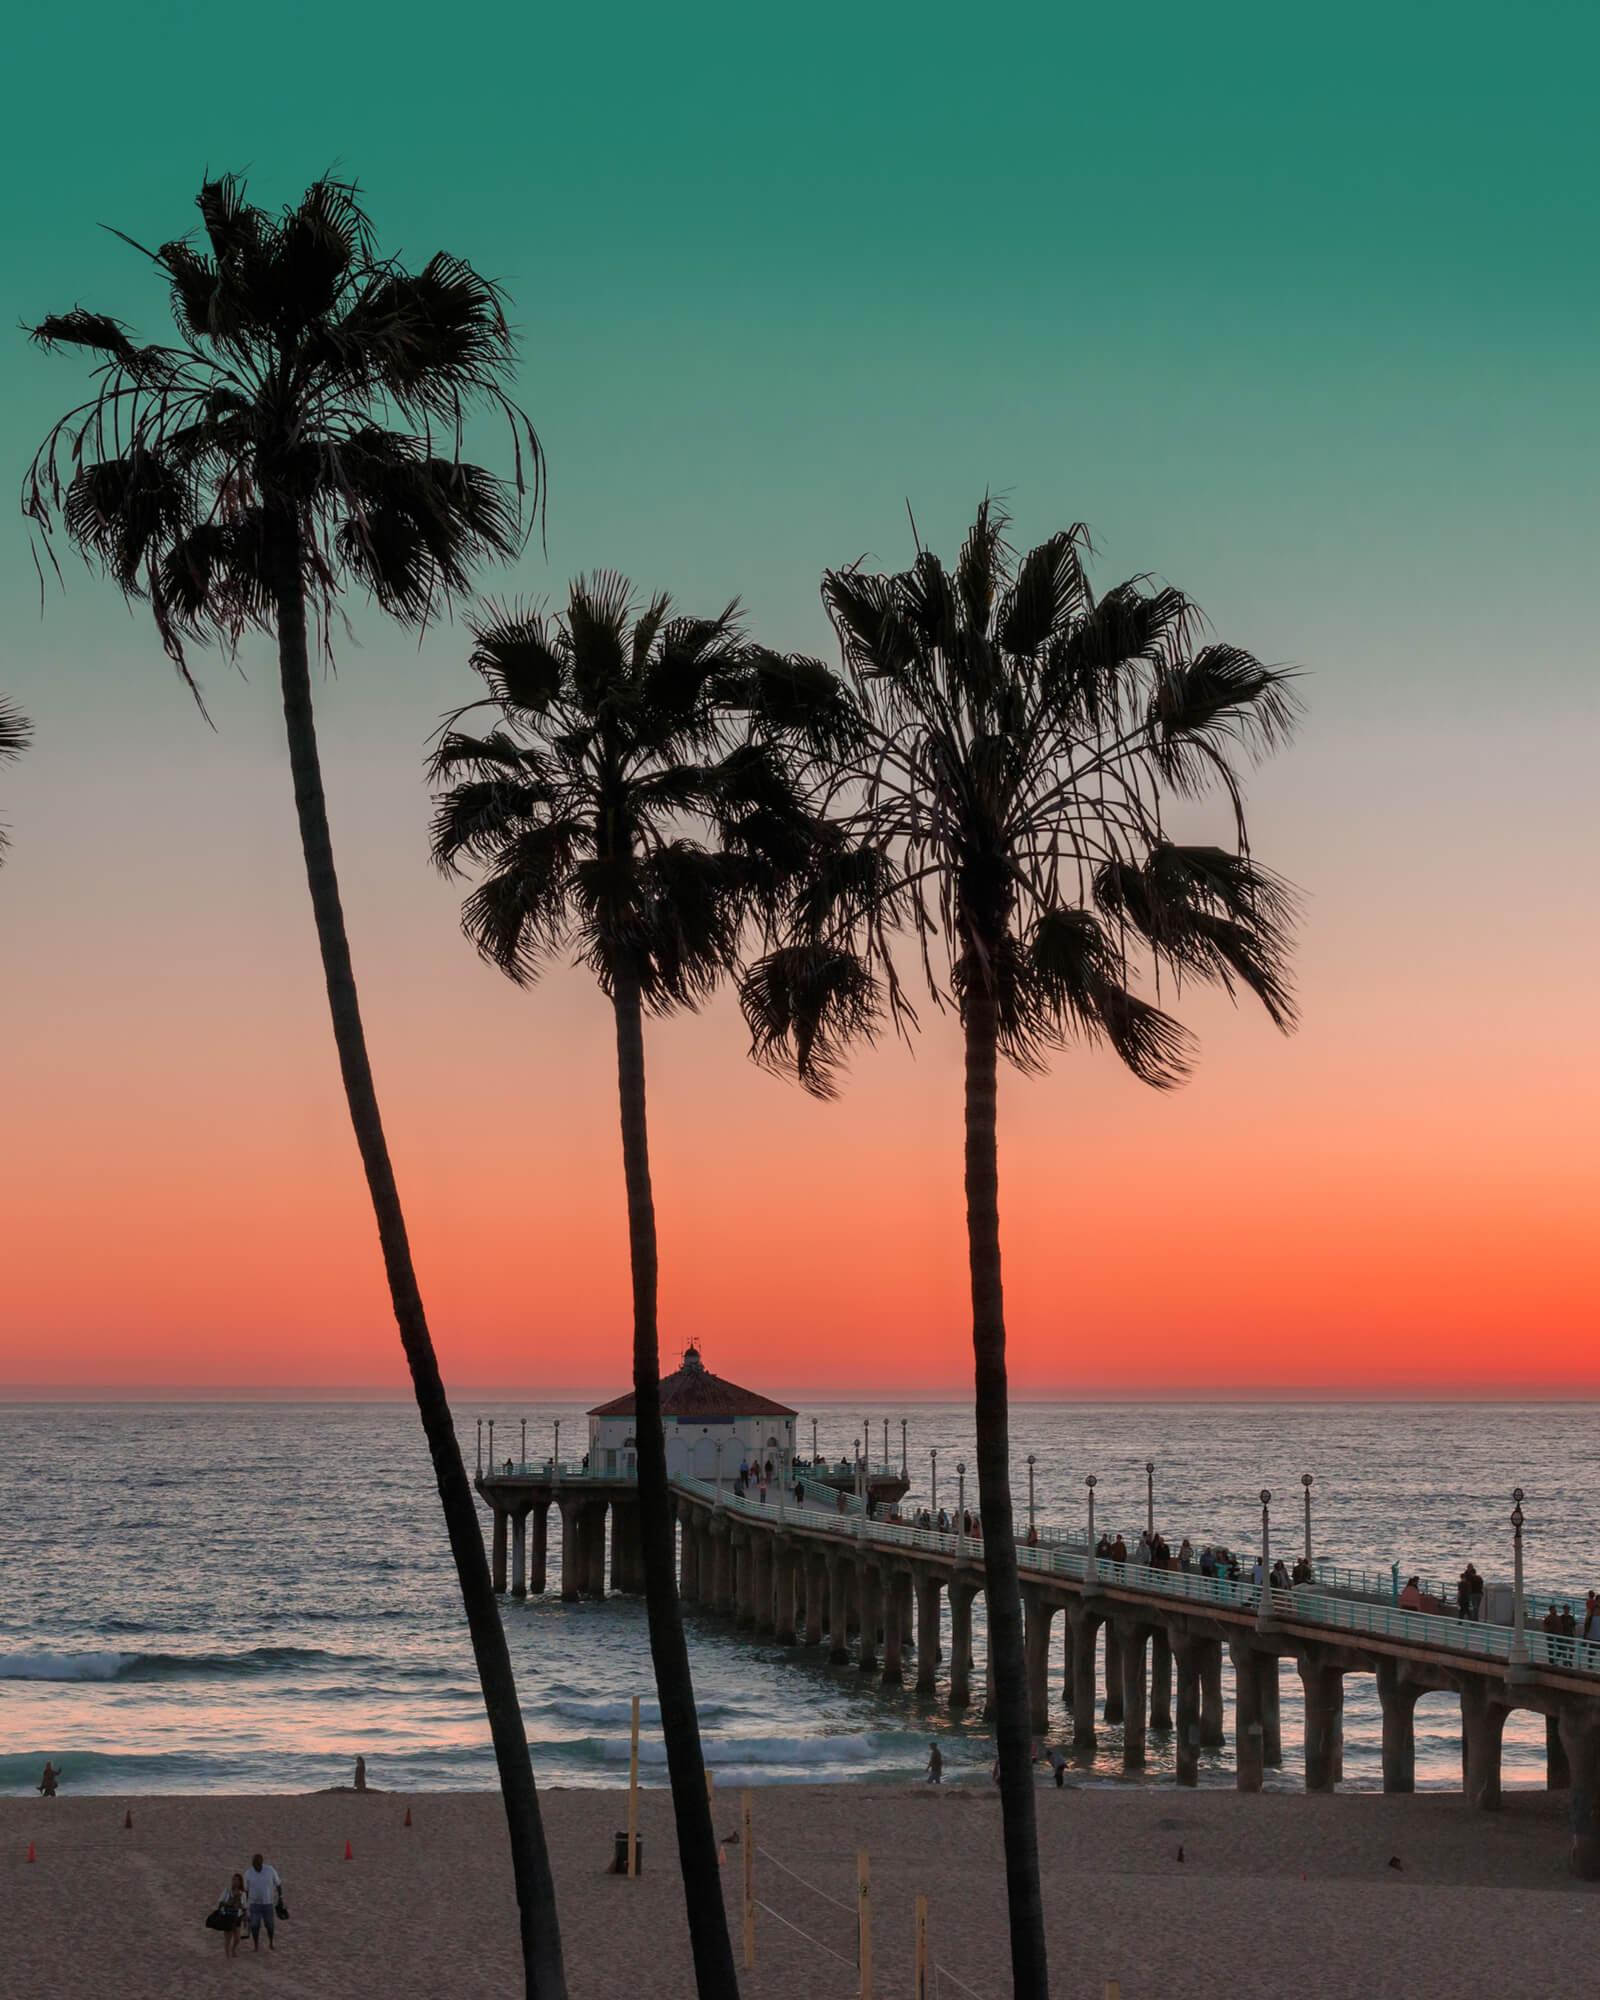 beautiful sunset beach view